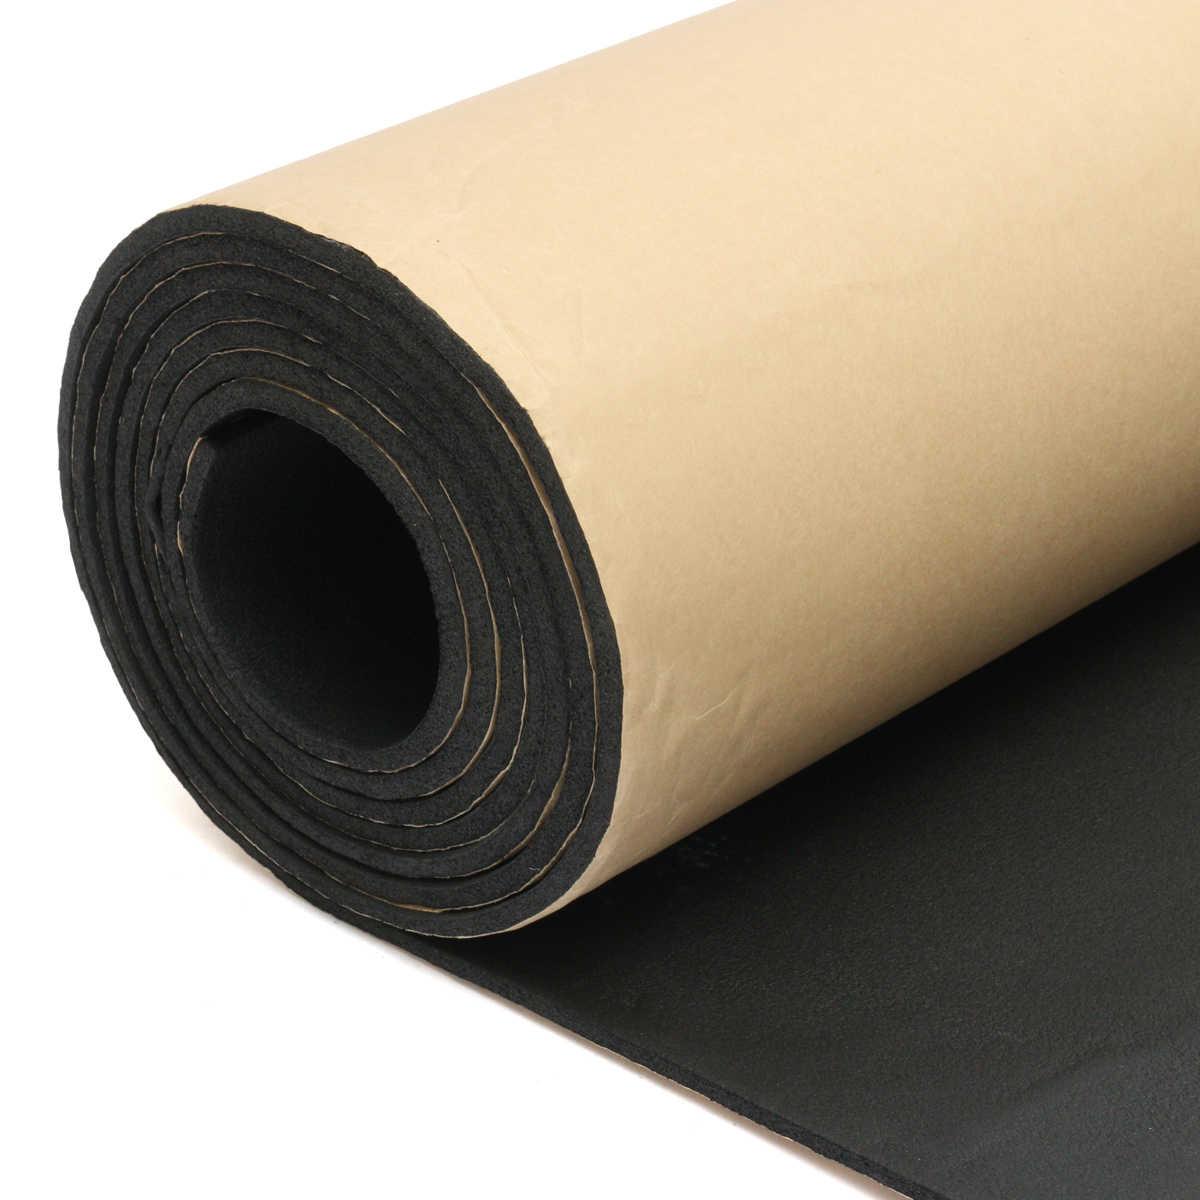 1 Roll 100cmx200cm 5mm Car Sound Heat Insulation Cotton Sound Proofing Deadening Insulation Foam Mat Acoustic Panel Self Adhesiv Sound Heat Insulation Cotton Aliexpress